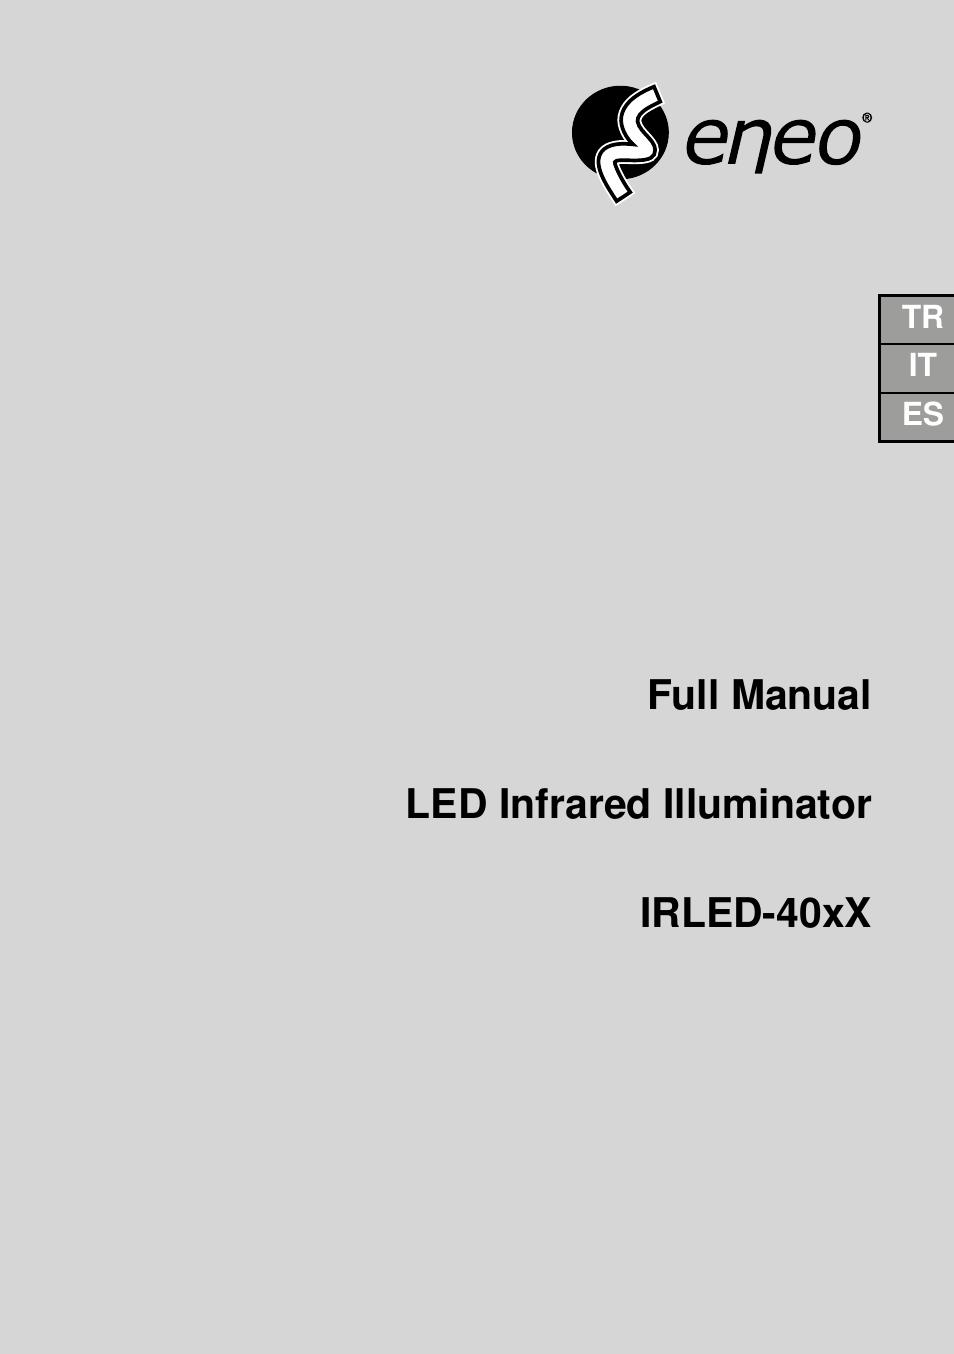 eneo irled 401e manual del usuario p u00e1ginas 32 tambi u00e9n para irled 401s  irled 402e  irled 402s